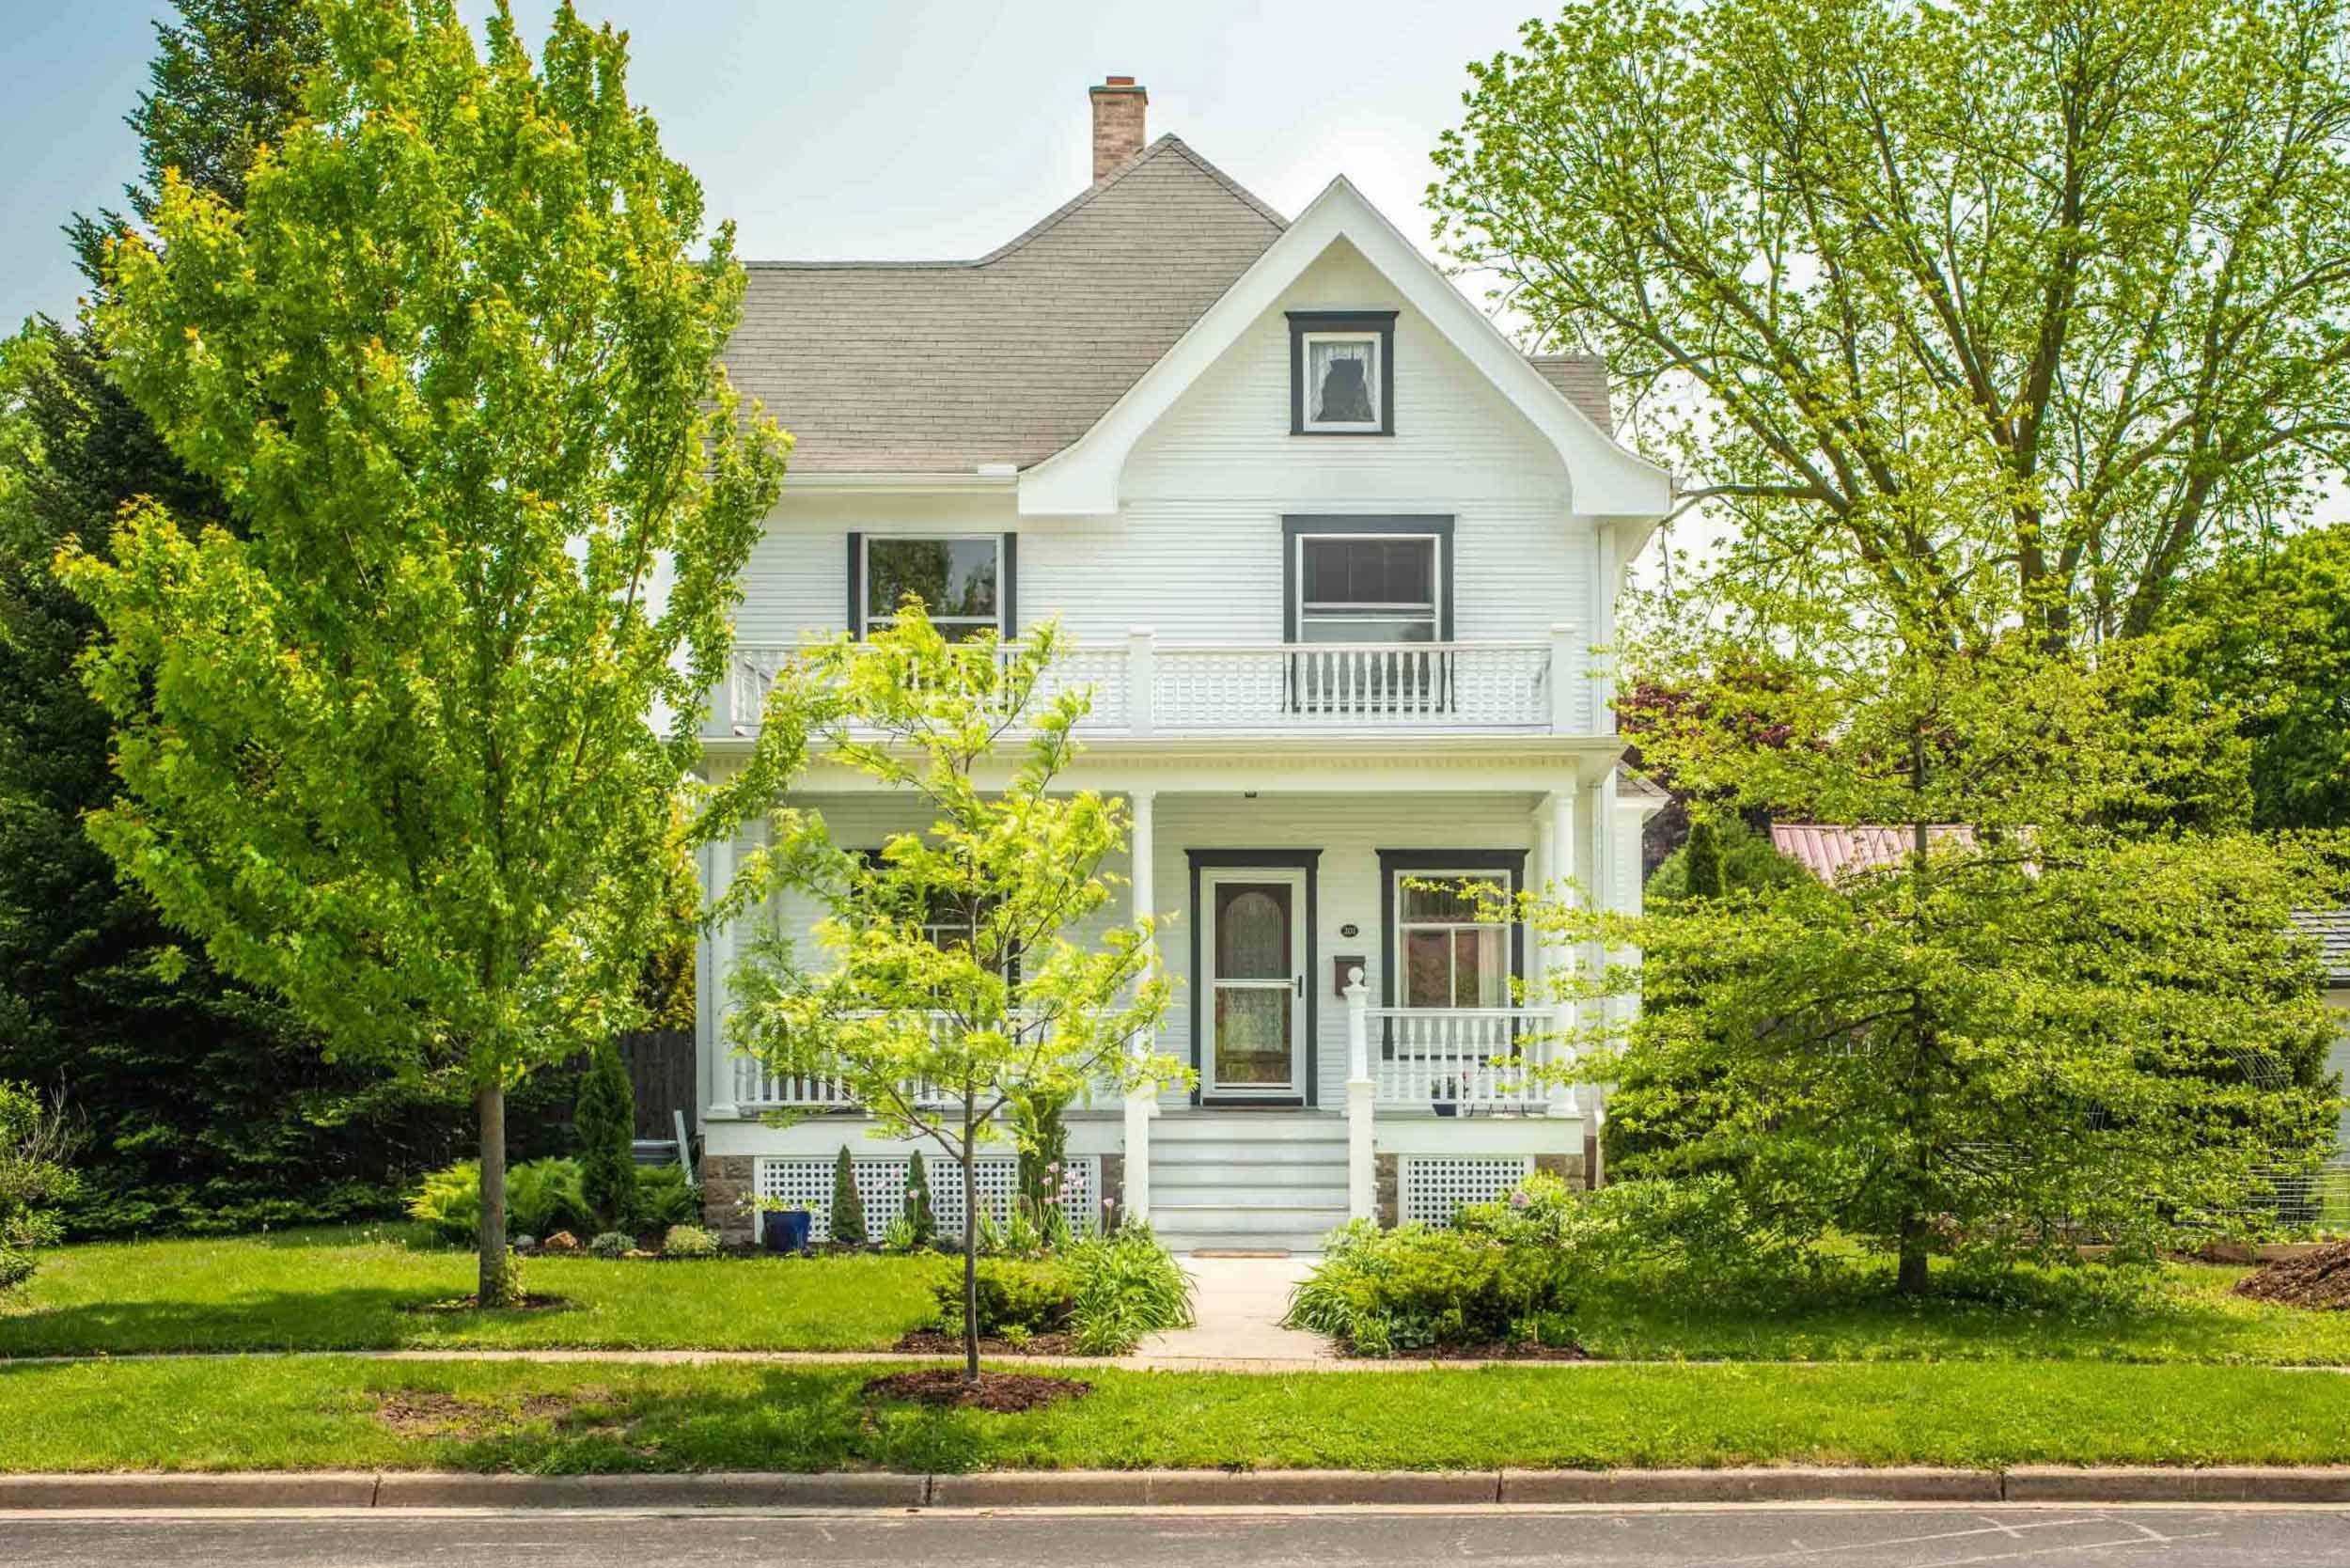 Historic-Victorian-Porch-Recreation-Madison-Wisconsin.jpg